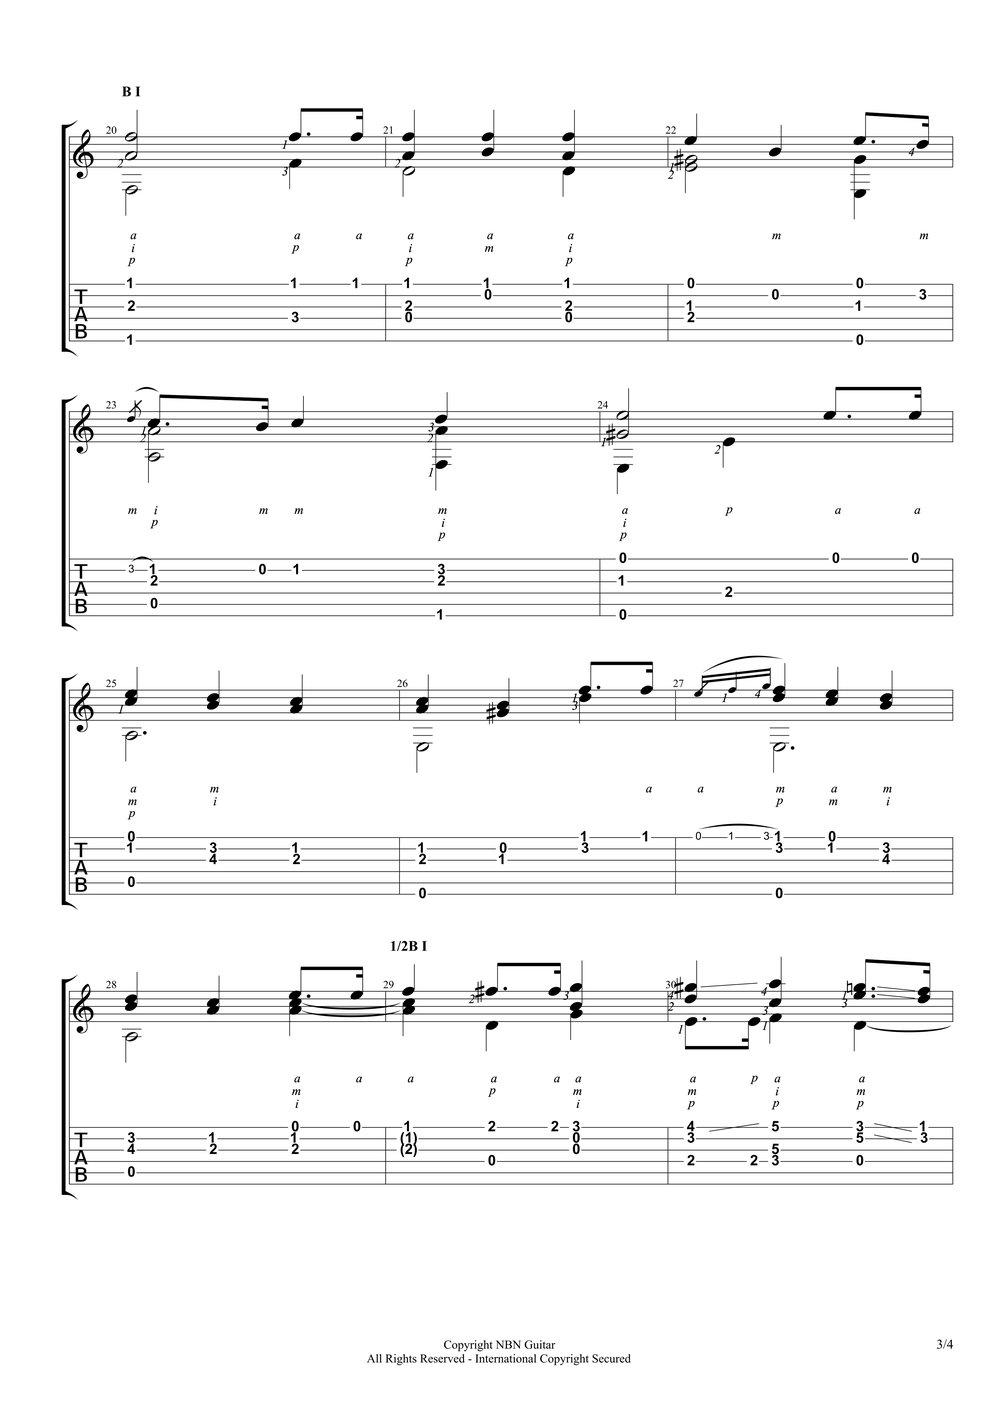 Etude No. 3, Op. 35 - Sor (Sheet Music & Tabs)-p5.jpg